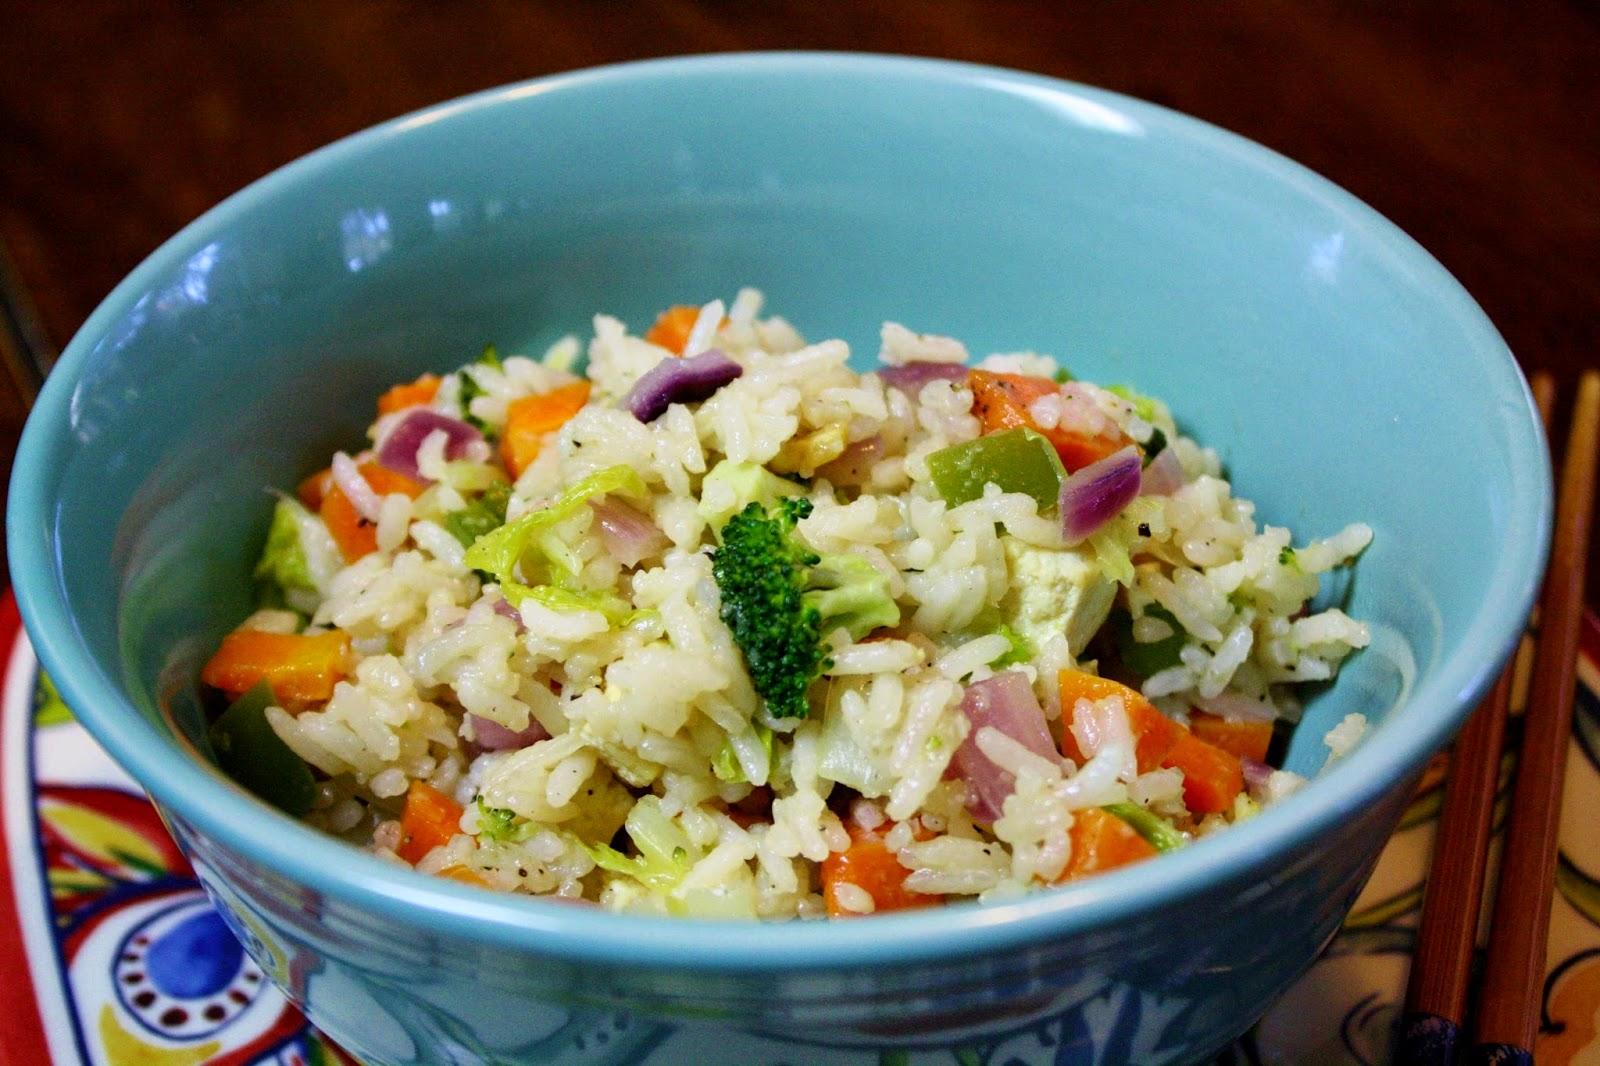 http://eatprayjuice.blogspot.com/2014/08/vegetable-fried-rice.html